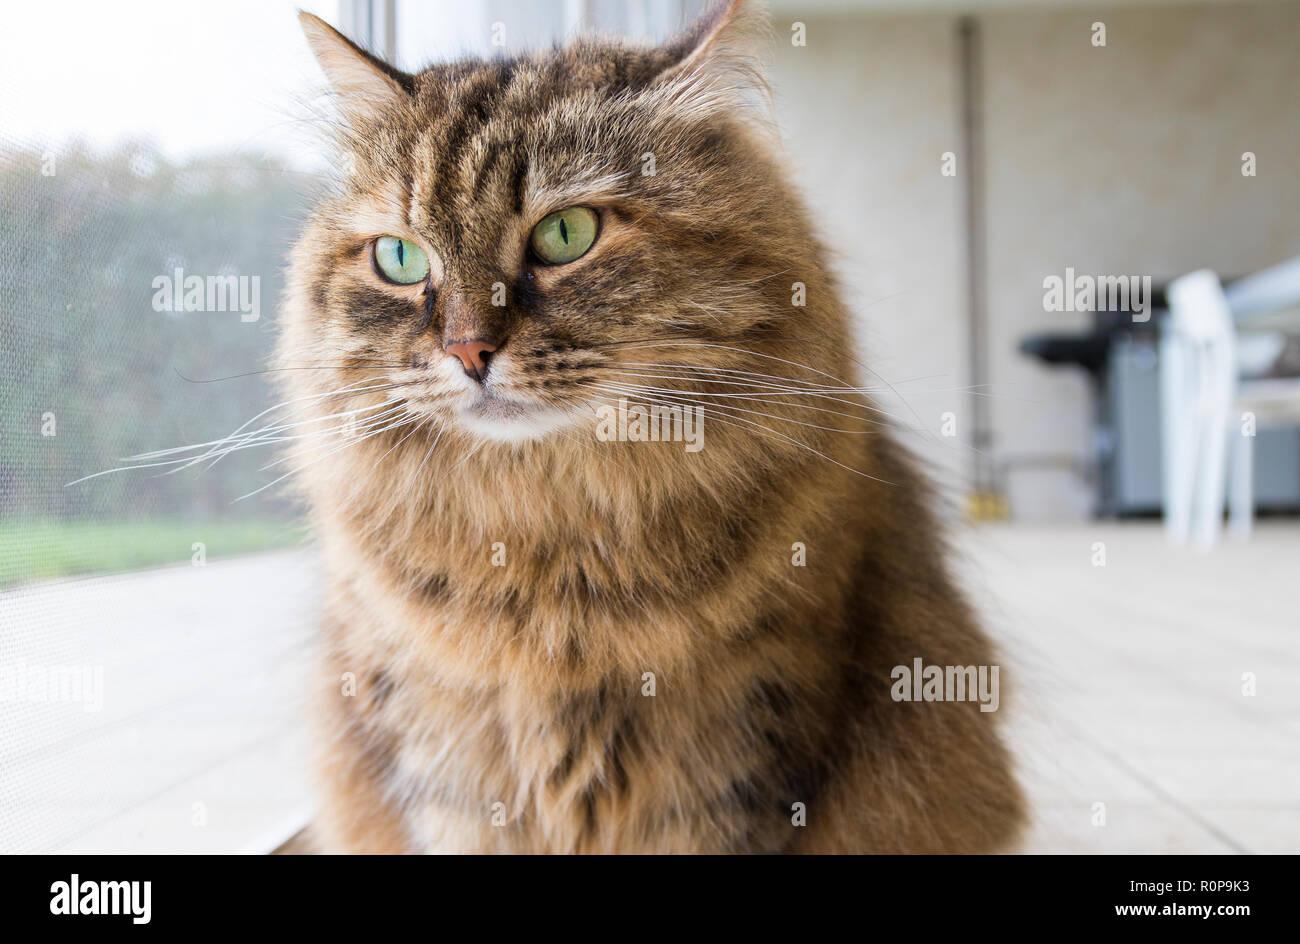 Neugierige Tiere Katze suche Outdoor, funny pet Stockbild